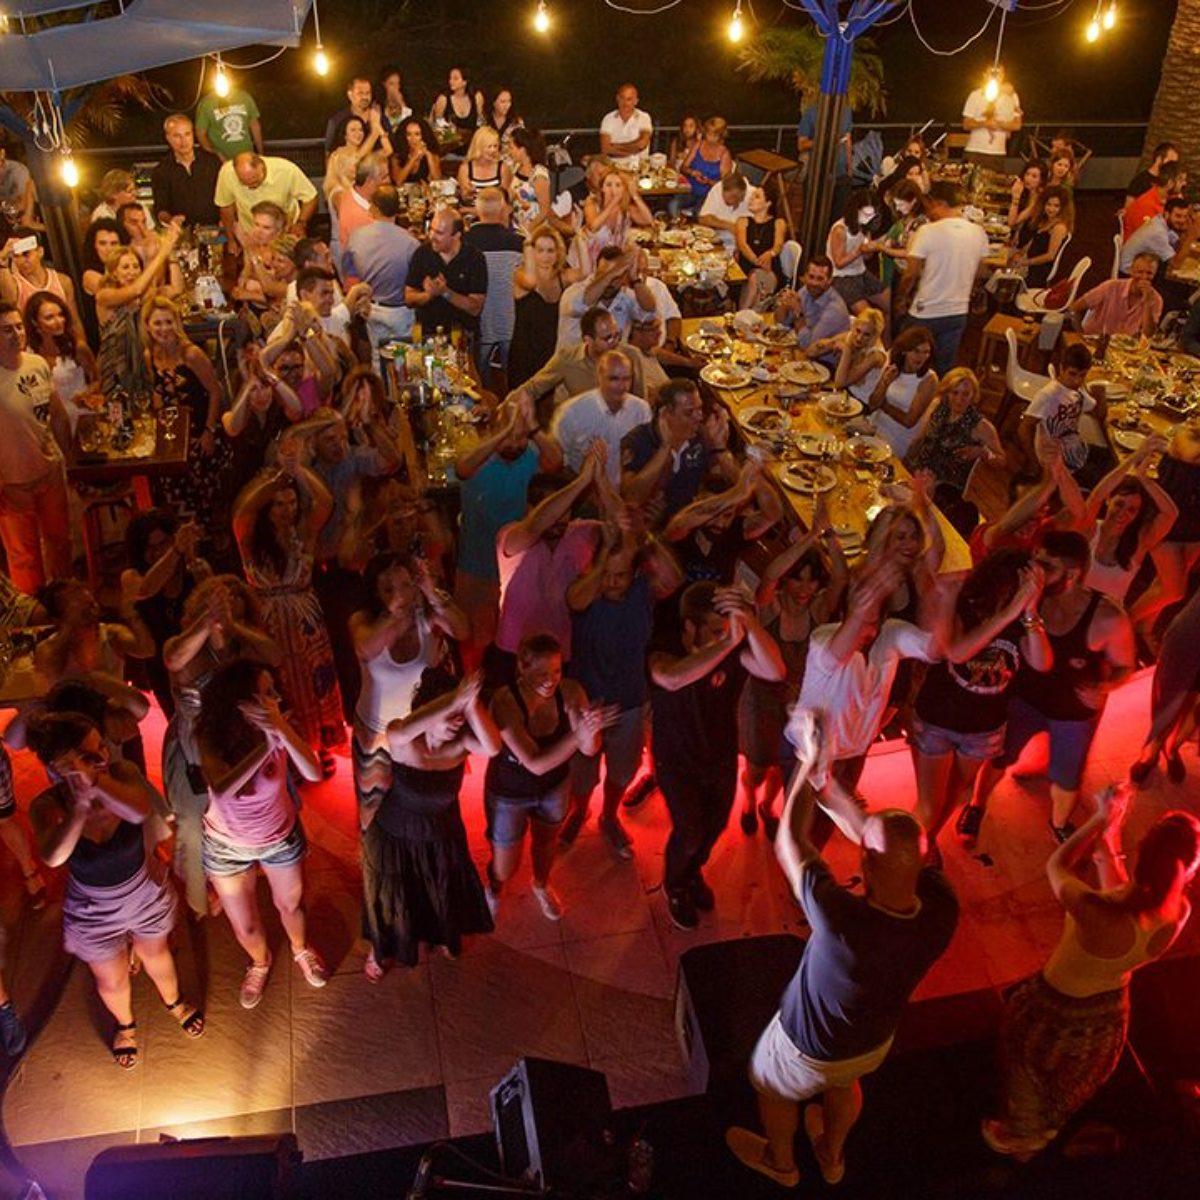 Yiamas Gastro Bar - Καλαμάτα - Μοντέρνα Ευρωπαϊκή Κουζίνα - Events